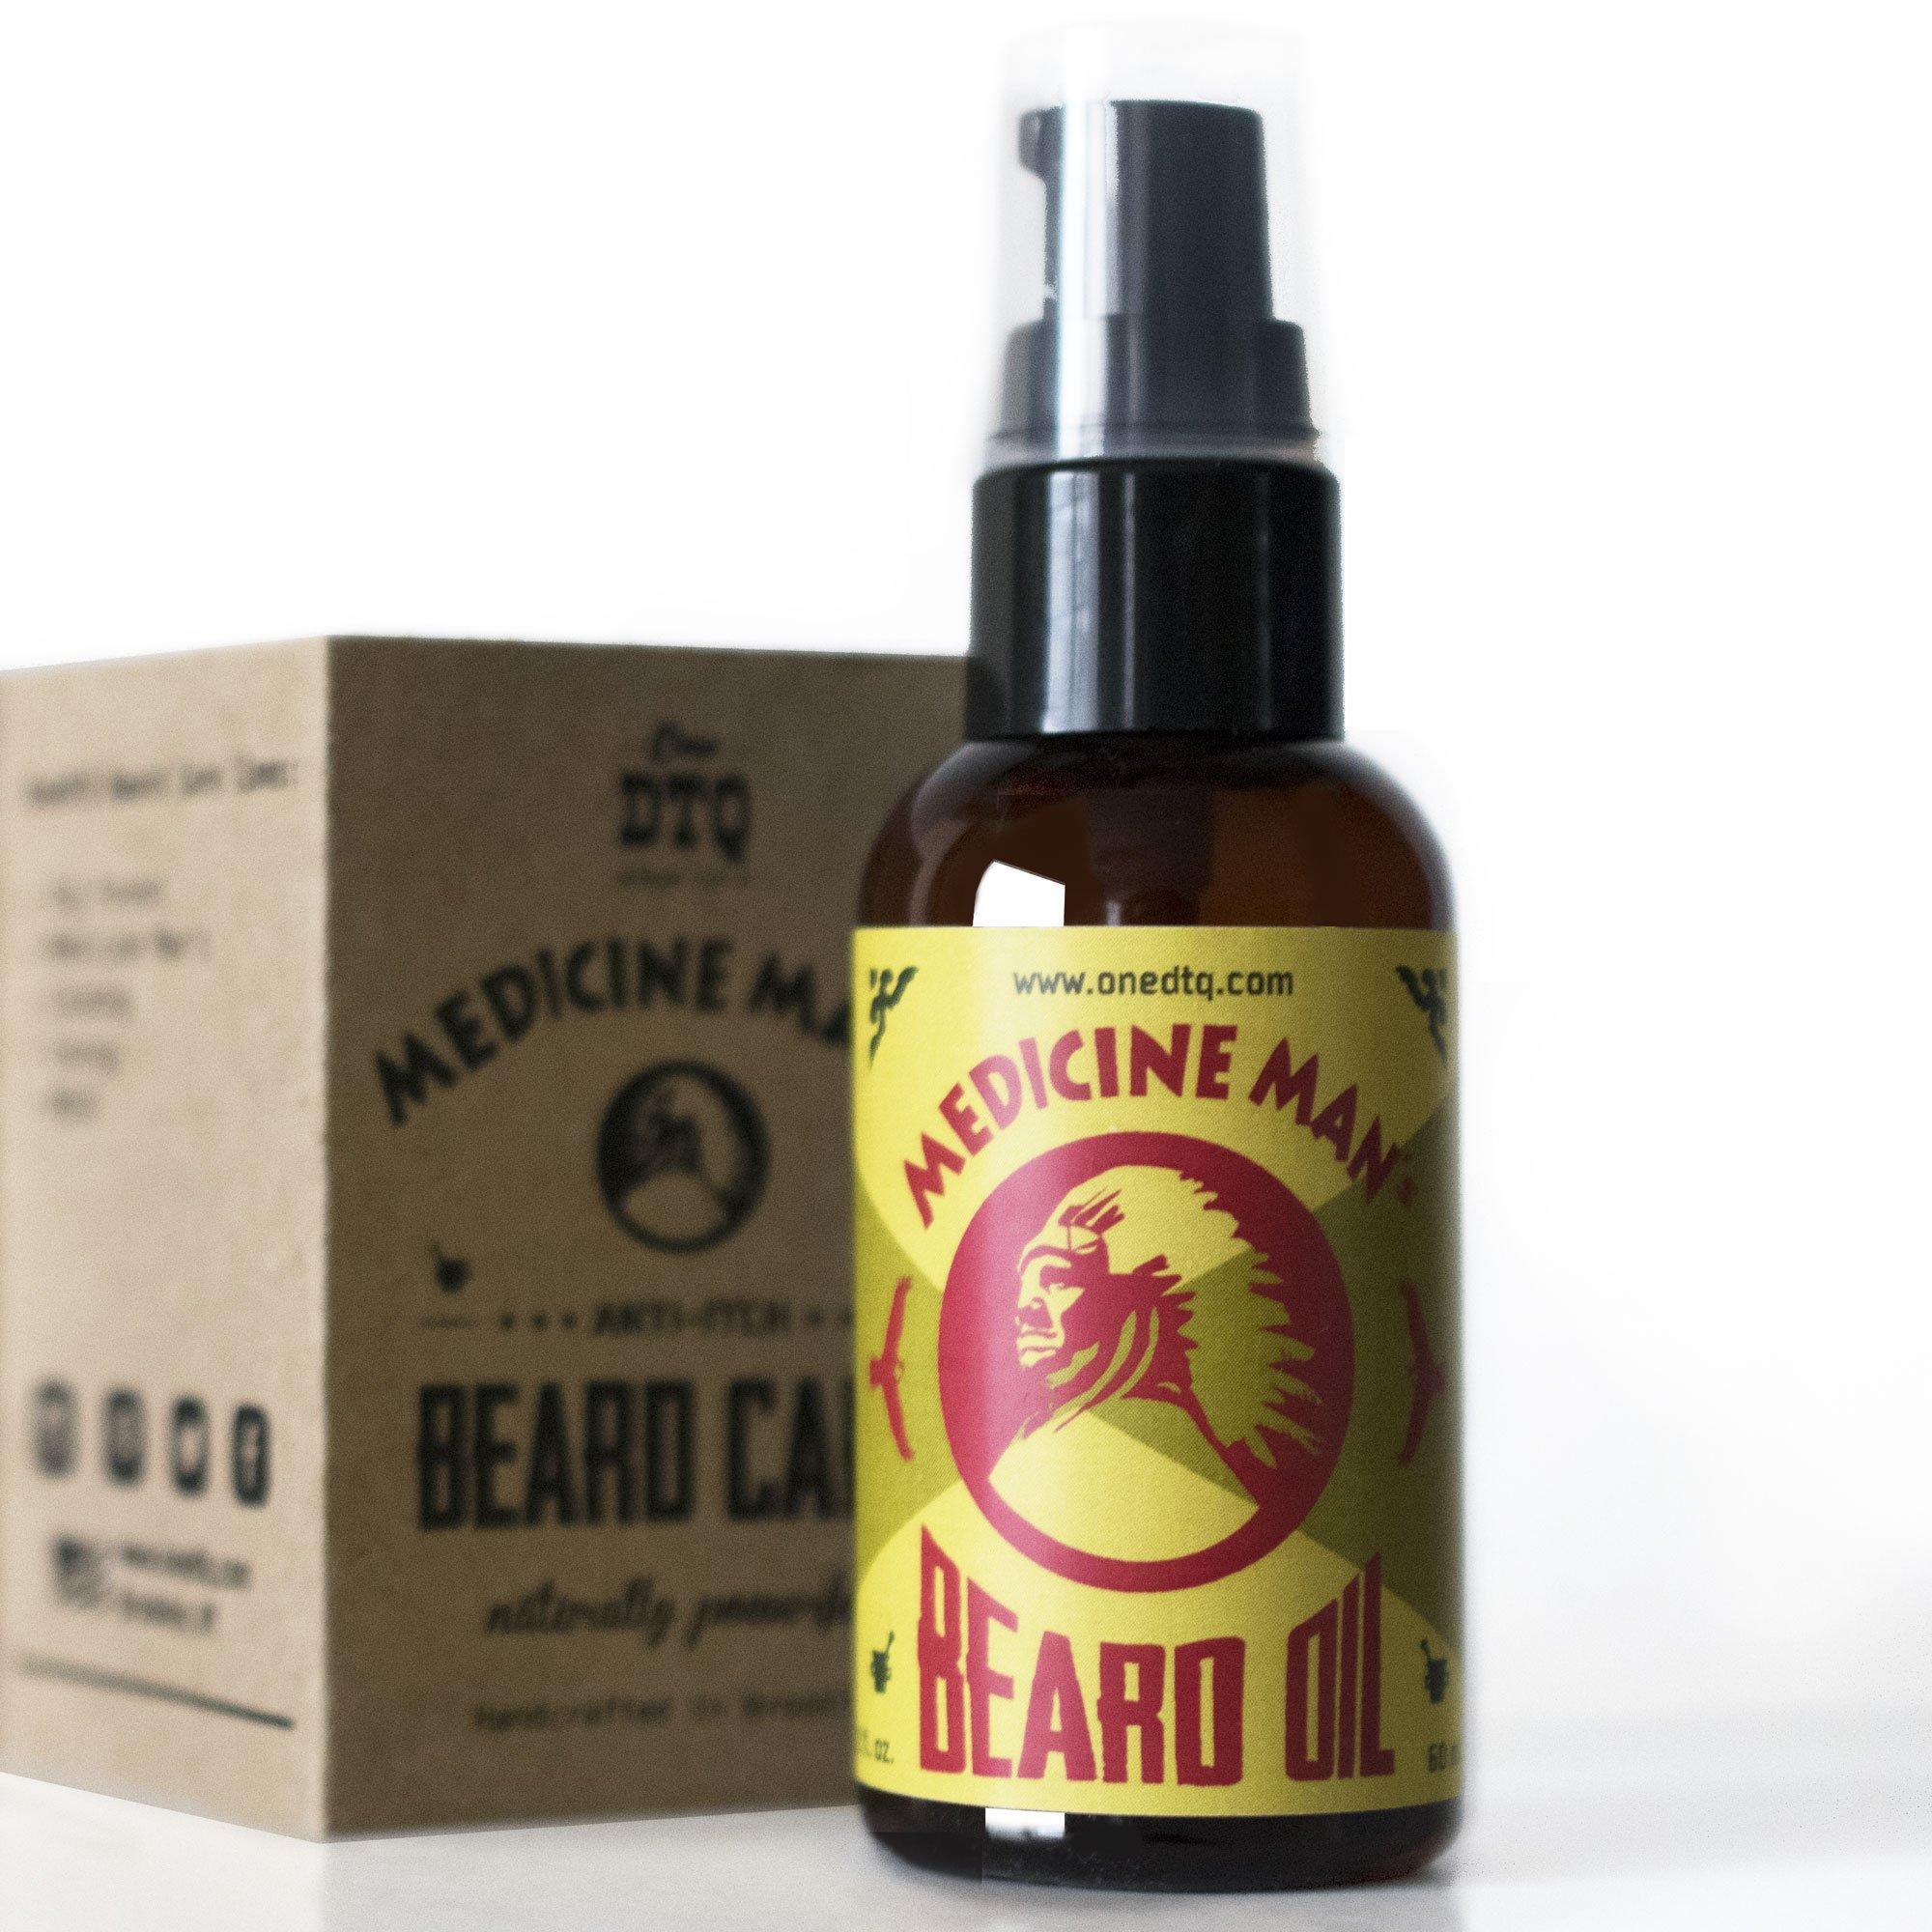 Medicine Man's Anti-itch Beard Oil 2 FL OZ - 100% Natural & Organic Leave-In Conditioner